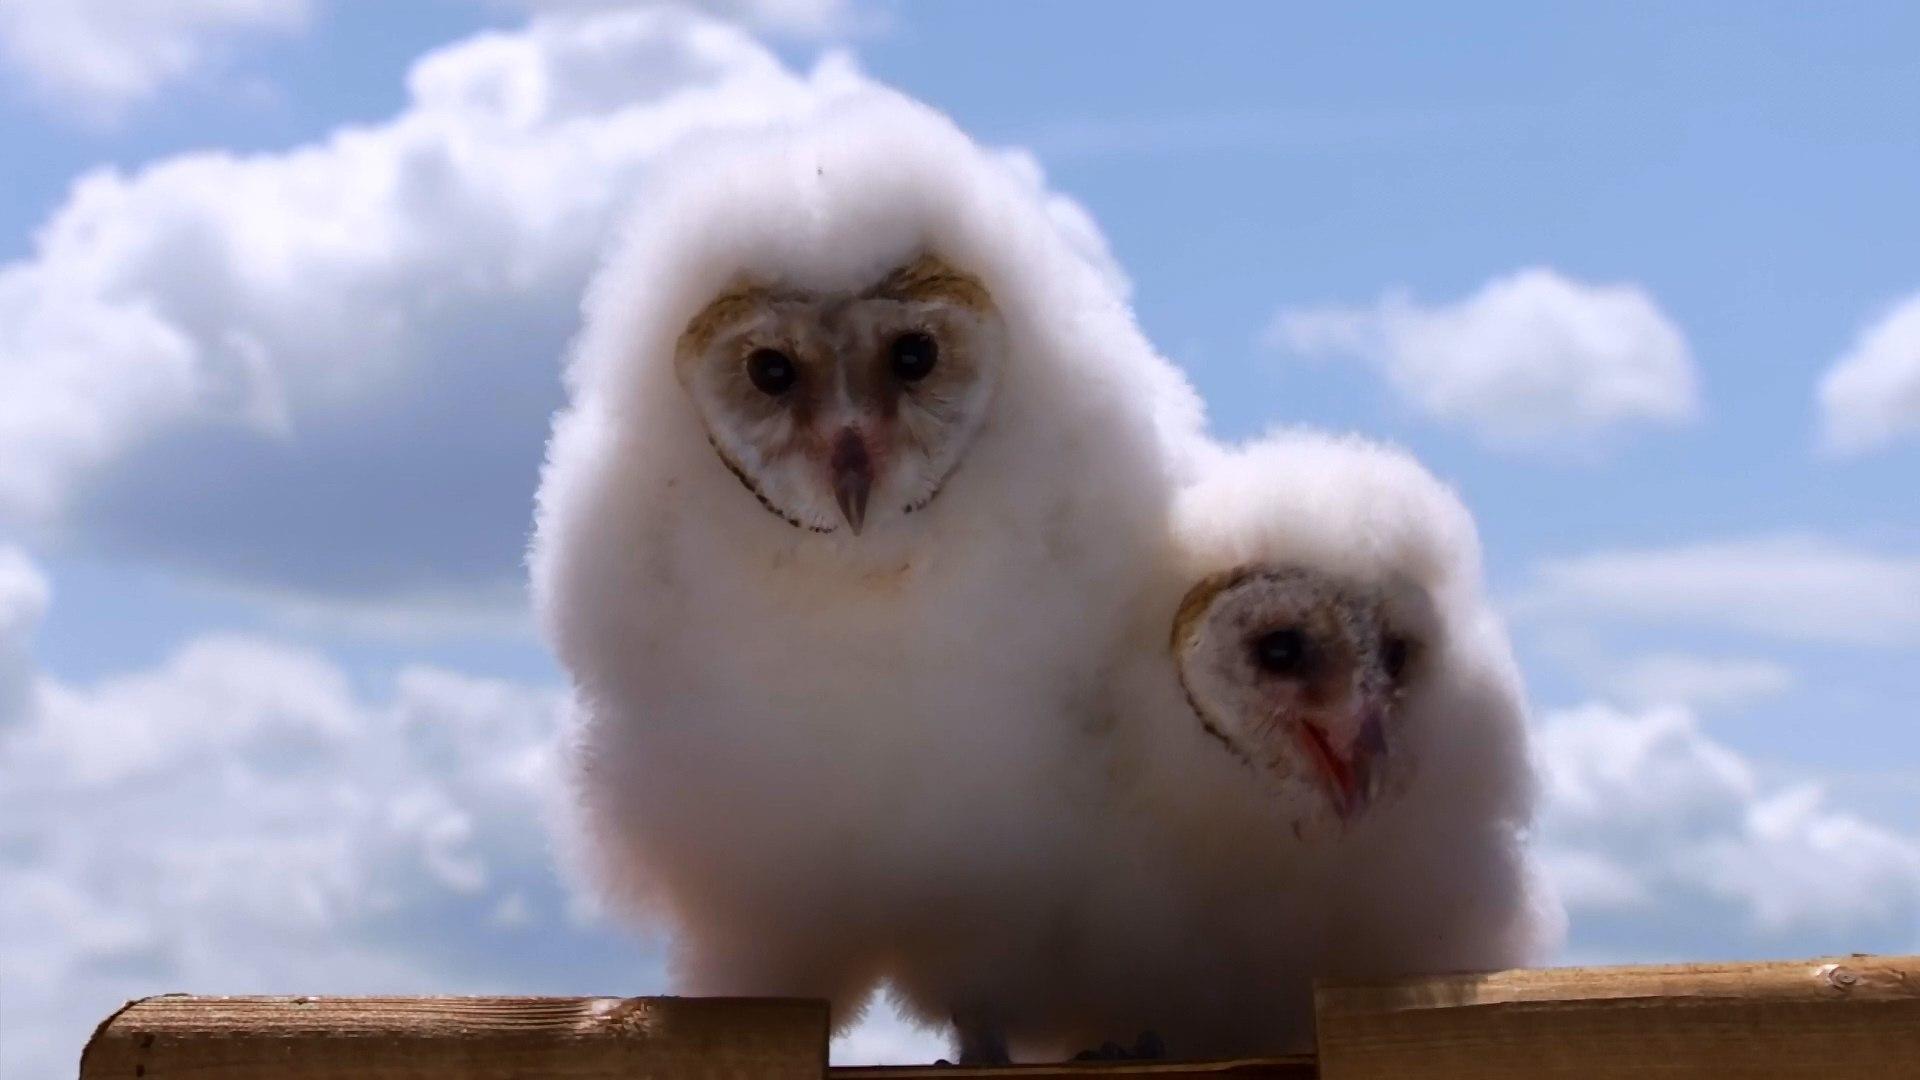 BBC Мир Природы.Совы По ту сторону тайны / The Natural World. Super Powered Owls (2015) HD1080p